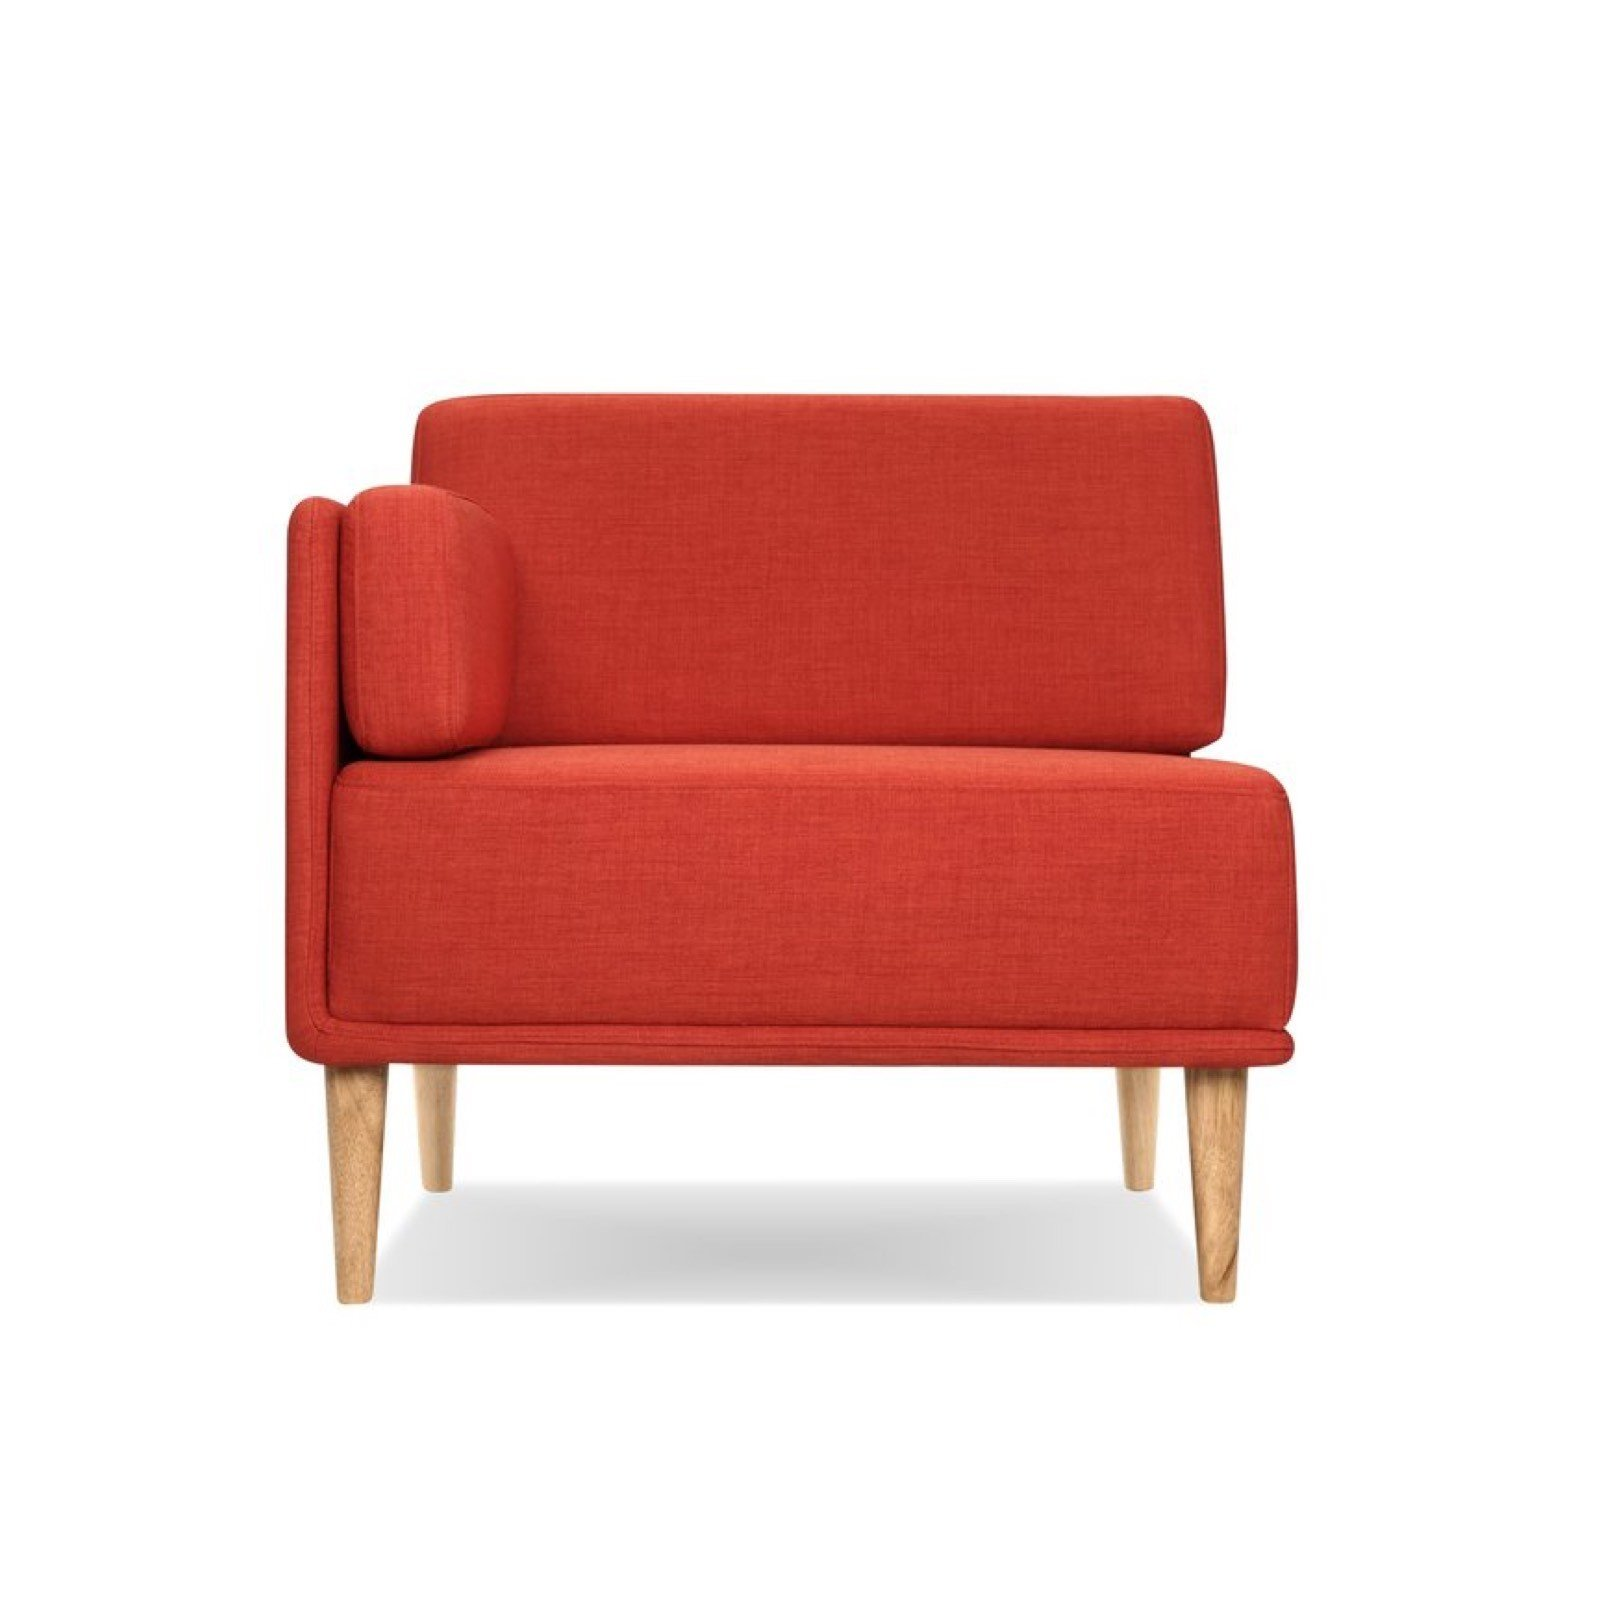 Capsule Home Knook Corner Chair